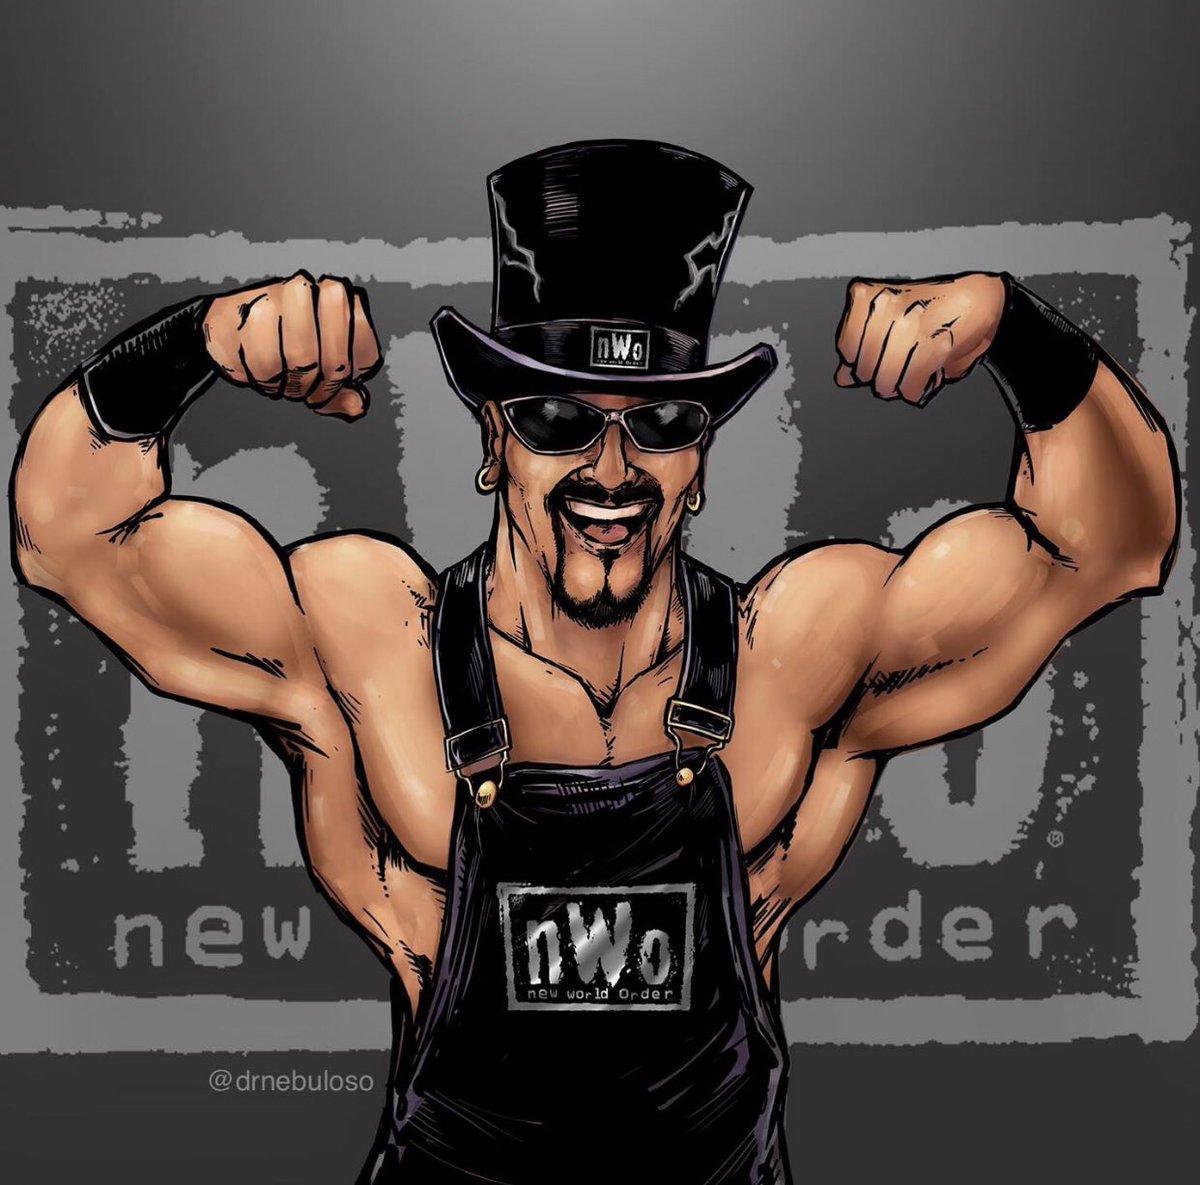 """I'm Buff, and I'm the stuff"" -Marcus Buff Bagwell @REALbuffbagwell   #nwo #wrestling #nwobirthday #wcw #wwe #buffbagwell #marcusbagwell #wrestlingfanart #prowrestling #90s #nwohistory #hulkhogan #scotthall #kevinnash #mondaynightwars #mondaynitro #newworldorder #4life #nwo4life"